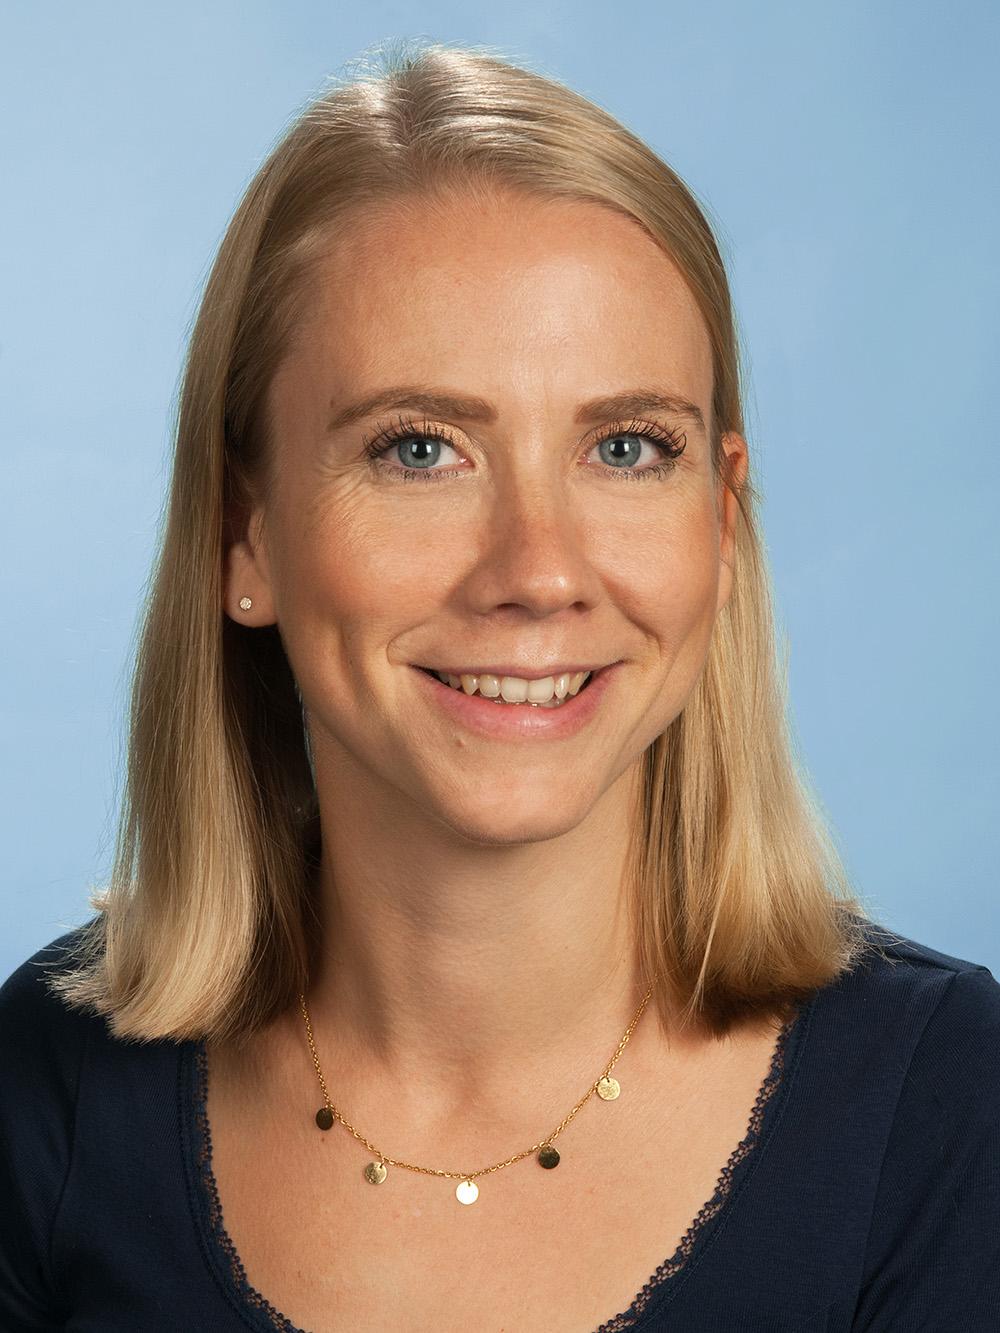 Anne-Marie Krömer